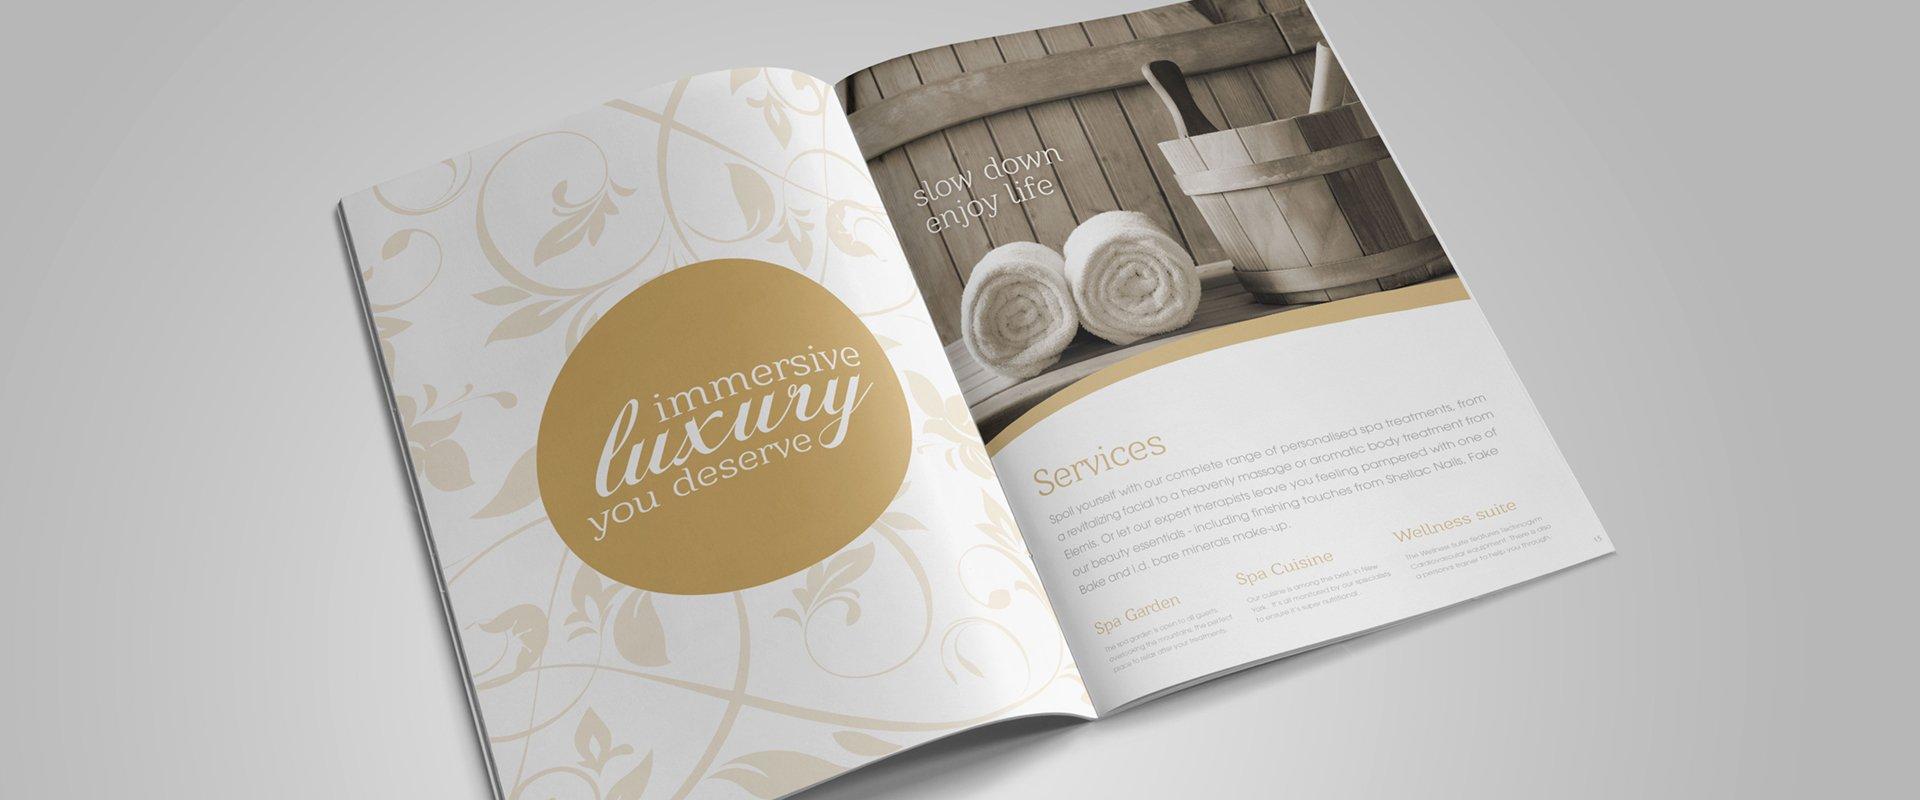 Windham Spa Brochure Design for Print – Spa Brochure